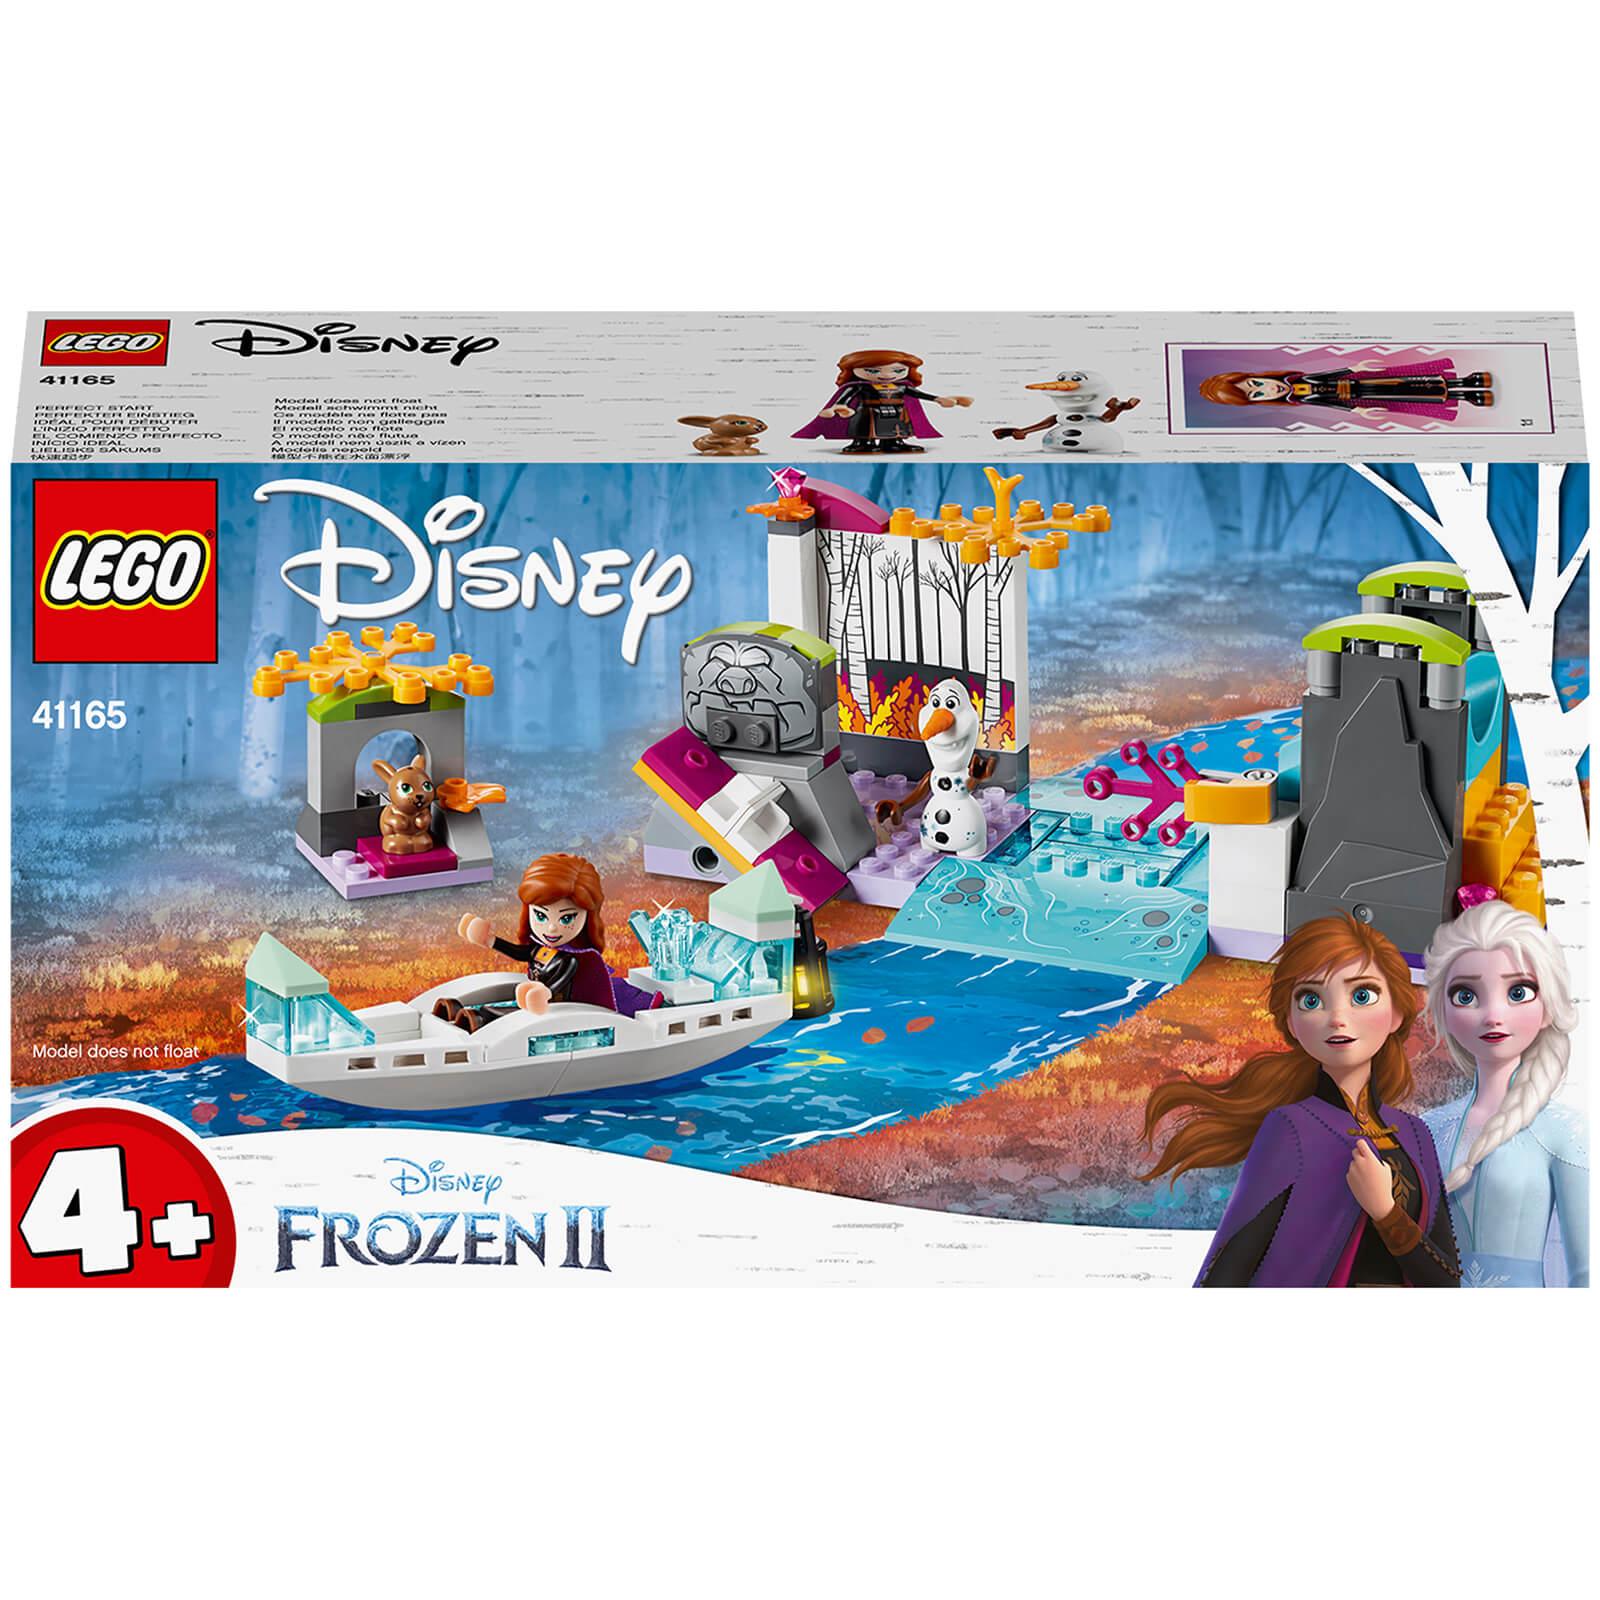 Image of 41165 LEGO® DISNEY Annas canoe ride